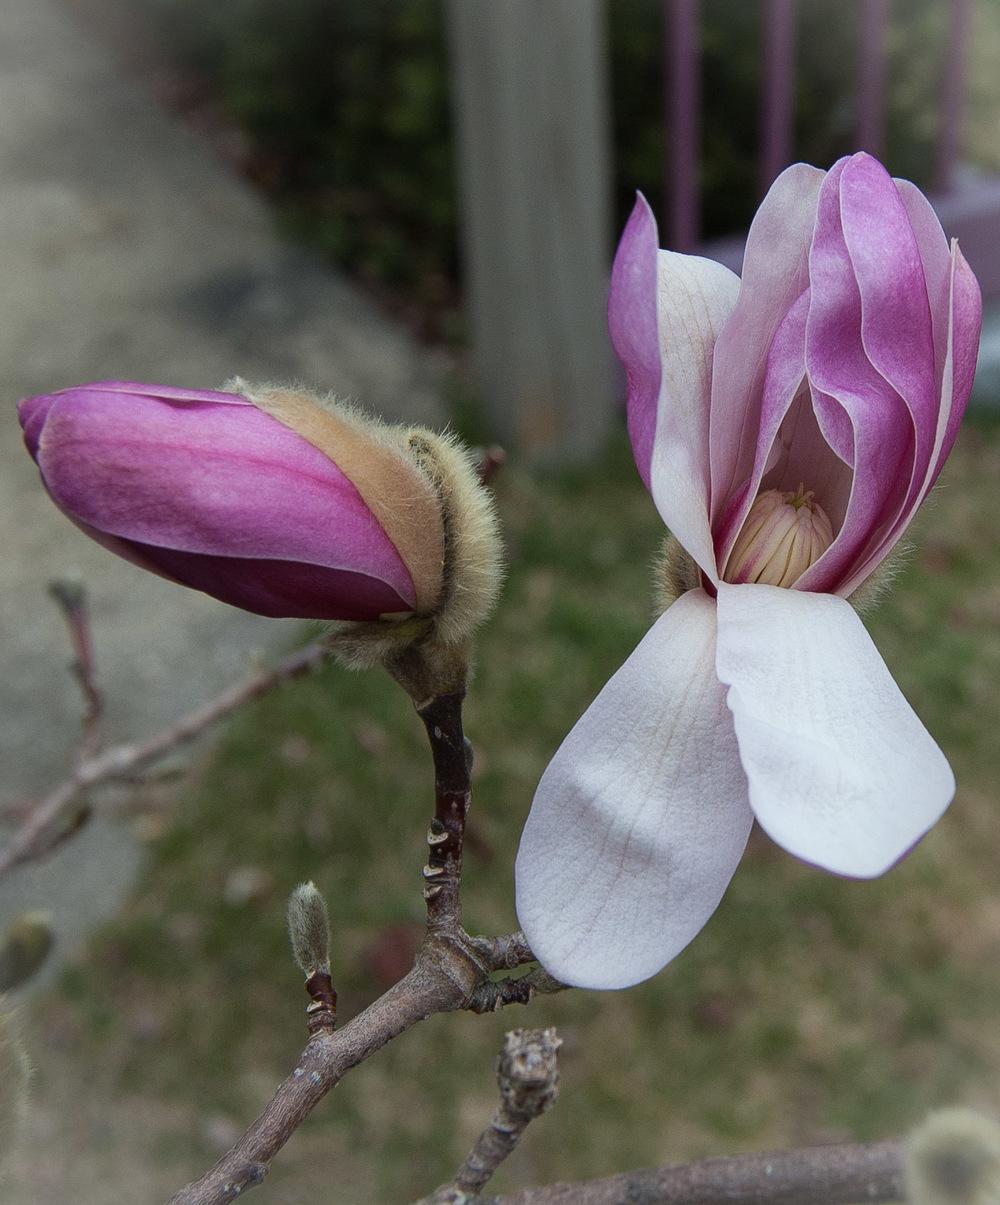 magnolia-0014.jpg